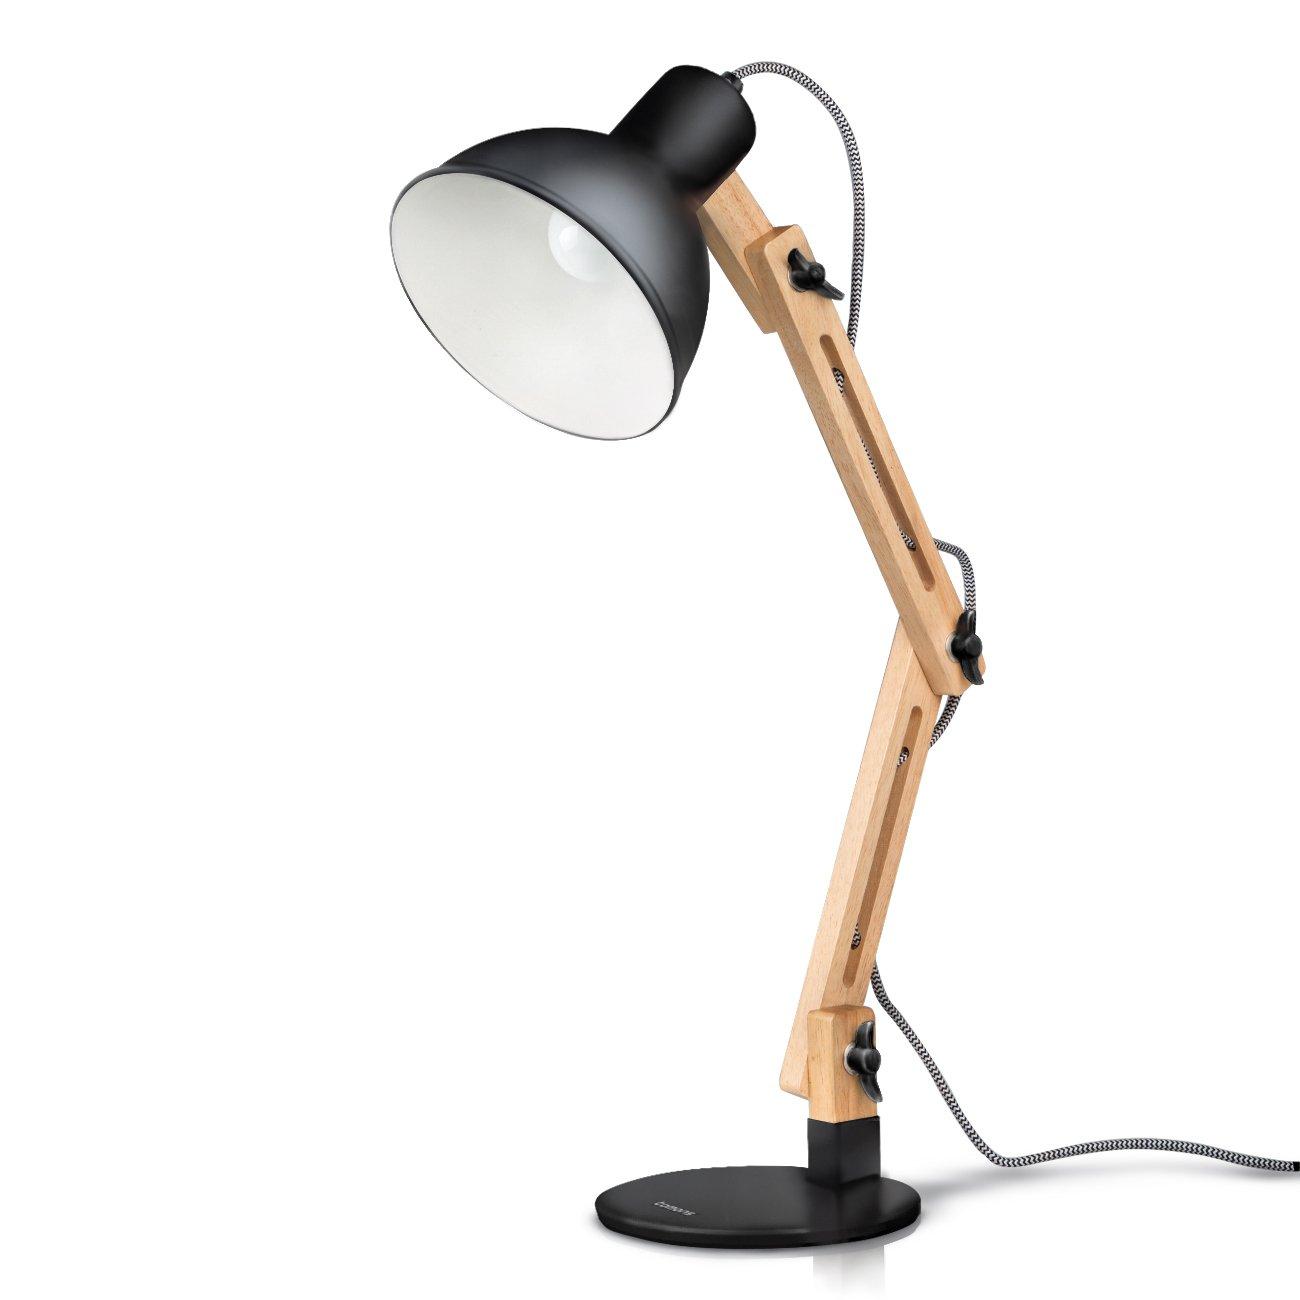 Tomons Scandinavian Swing Arm Wood Desk Lamp Table Lamp (LED Bulb Included)    Black: Amazon.co.uk: Kitchen U0026 Home Part 89